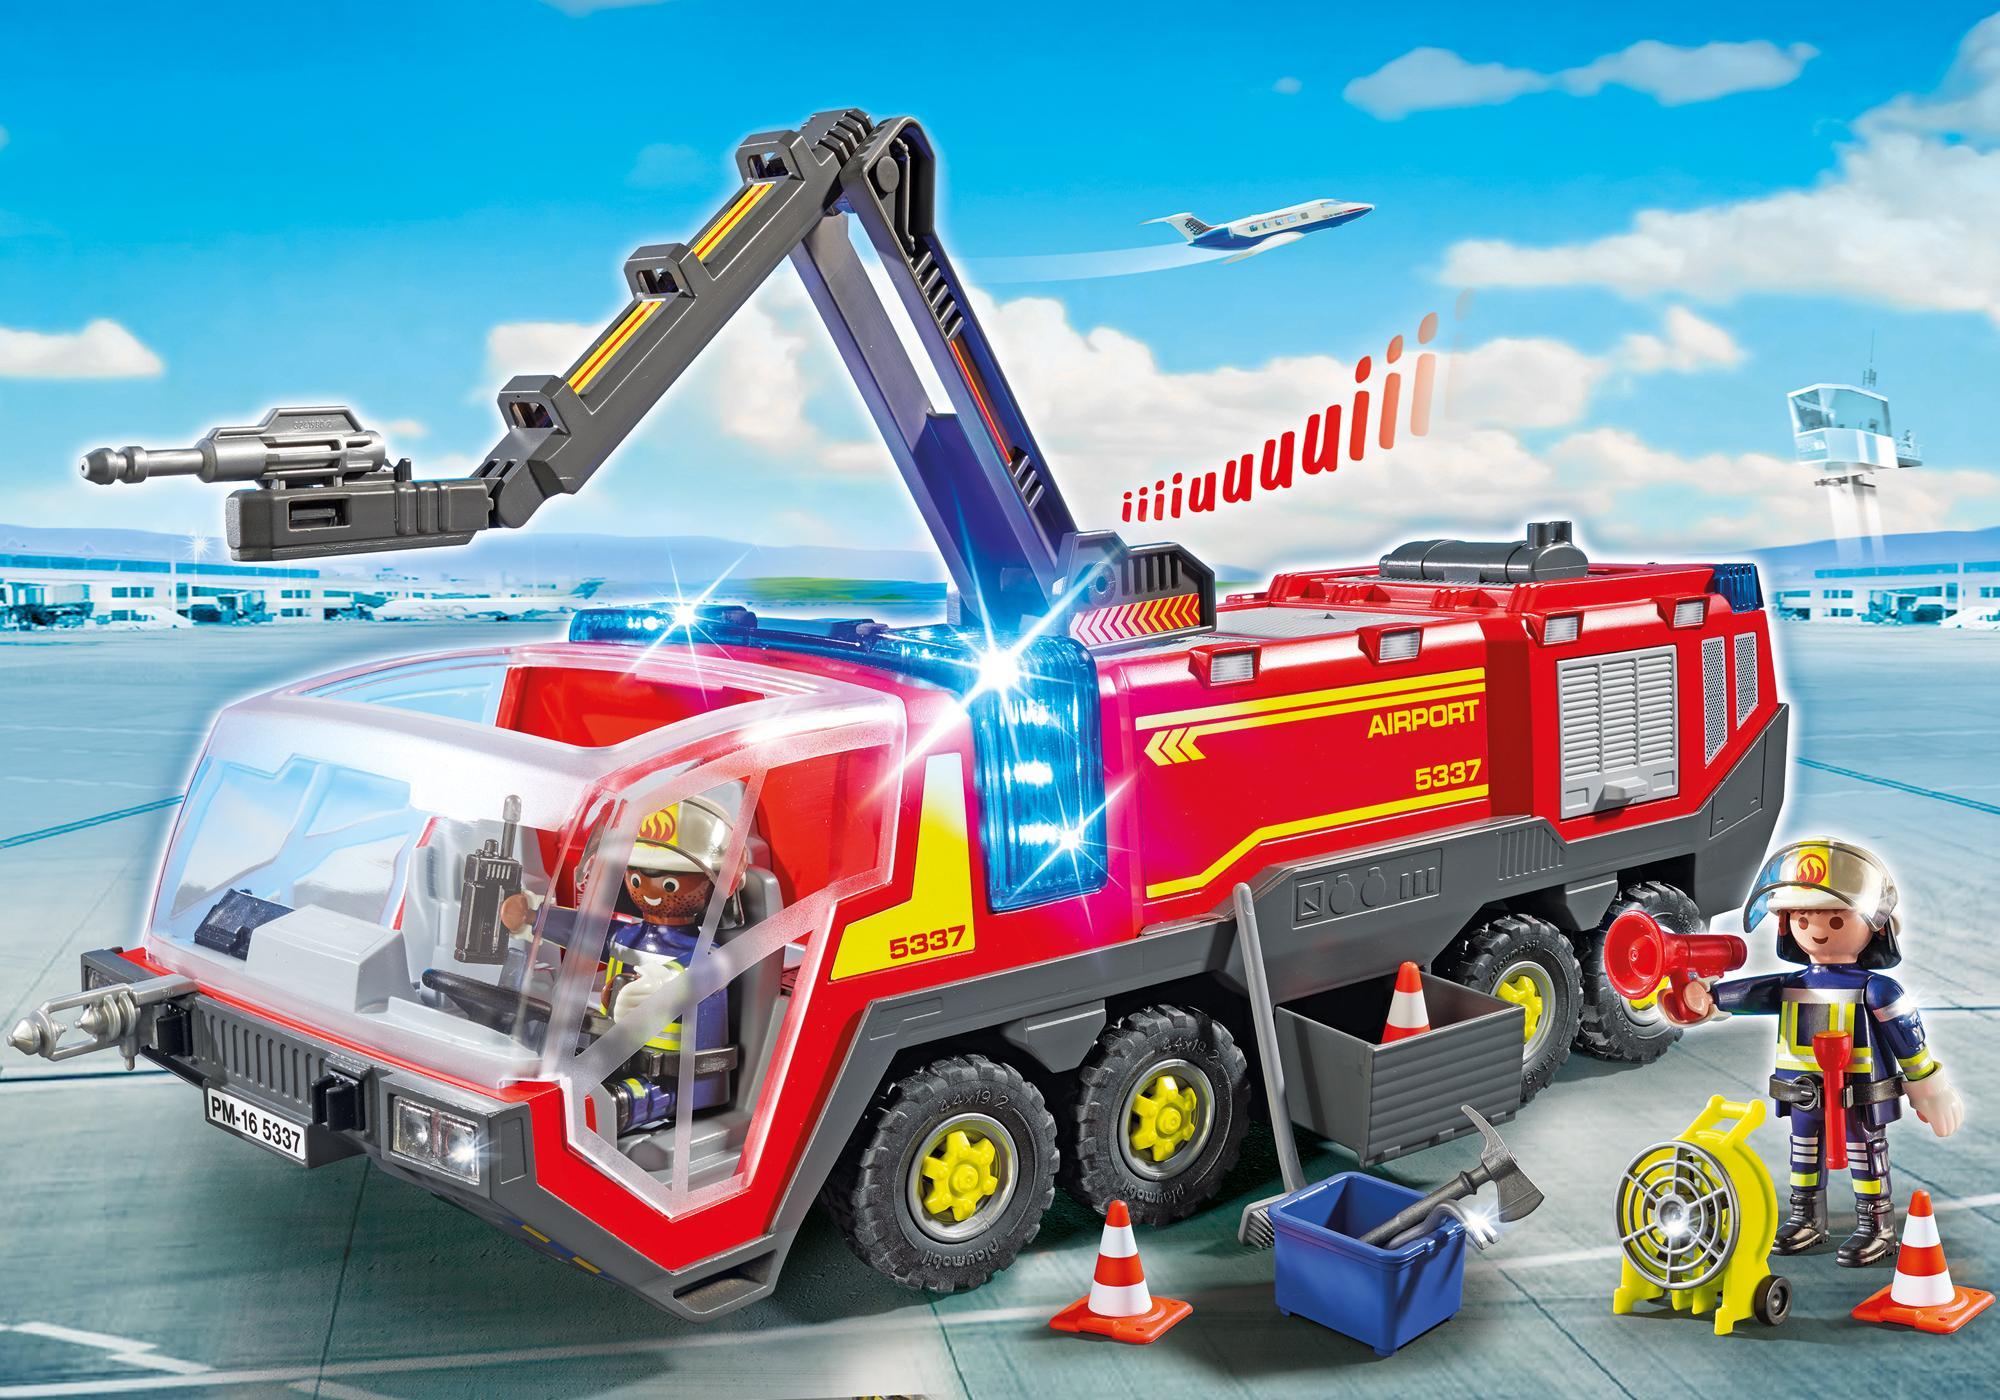 http://media.playmobil.com/i/playmobil/5337_product_detail